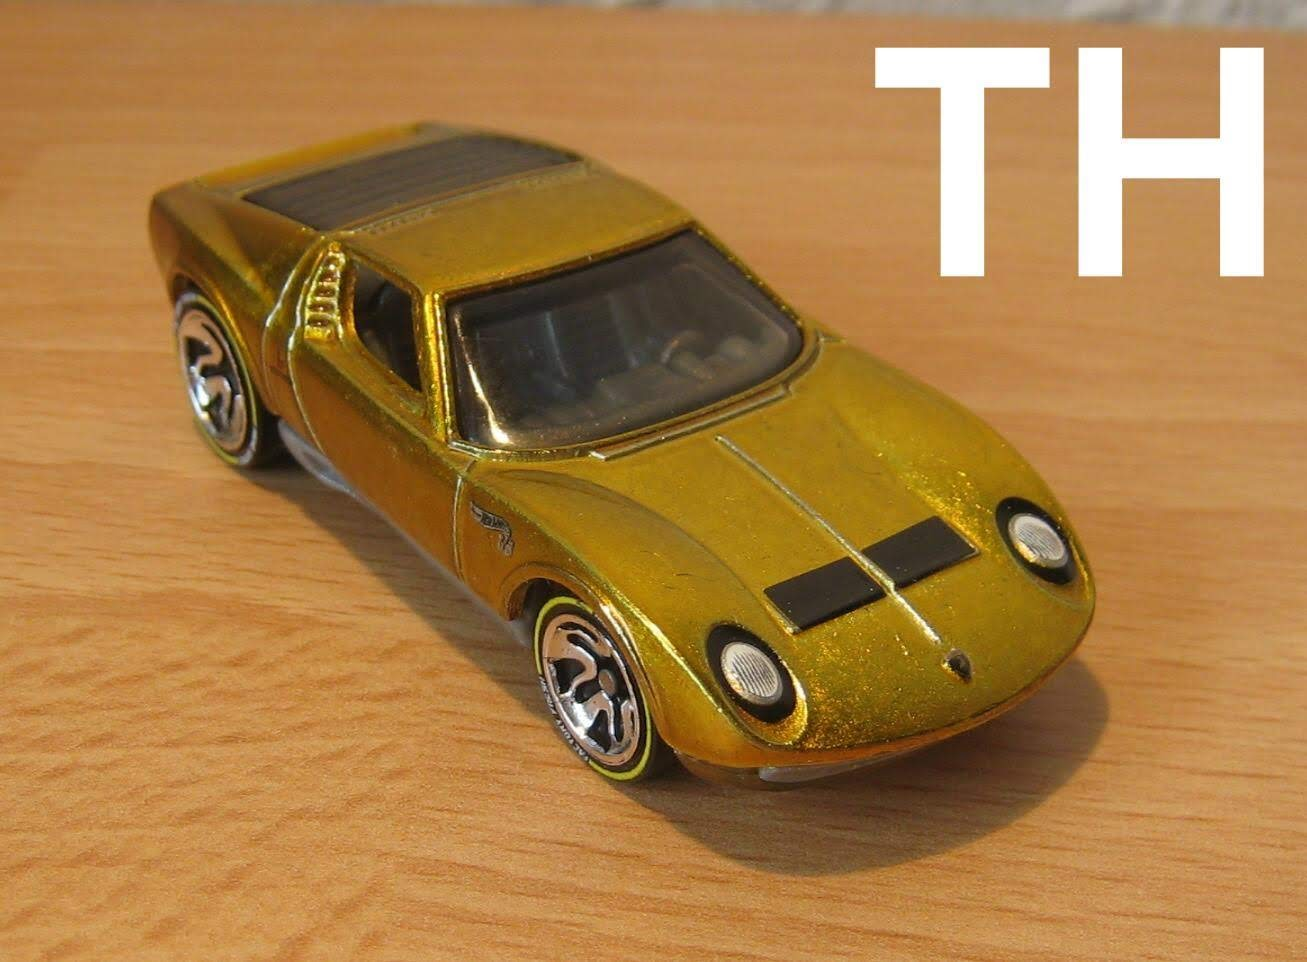 Hot Wheels Id Lamborghini Miura Sv 71 Grün Limitierte Auflage 1//64